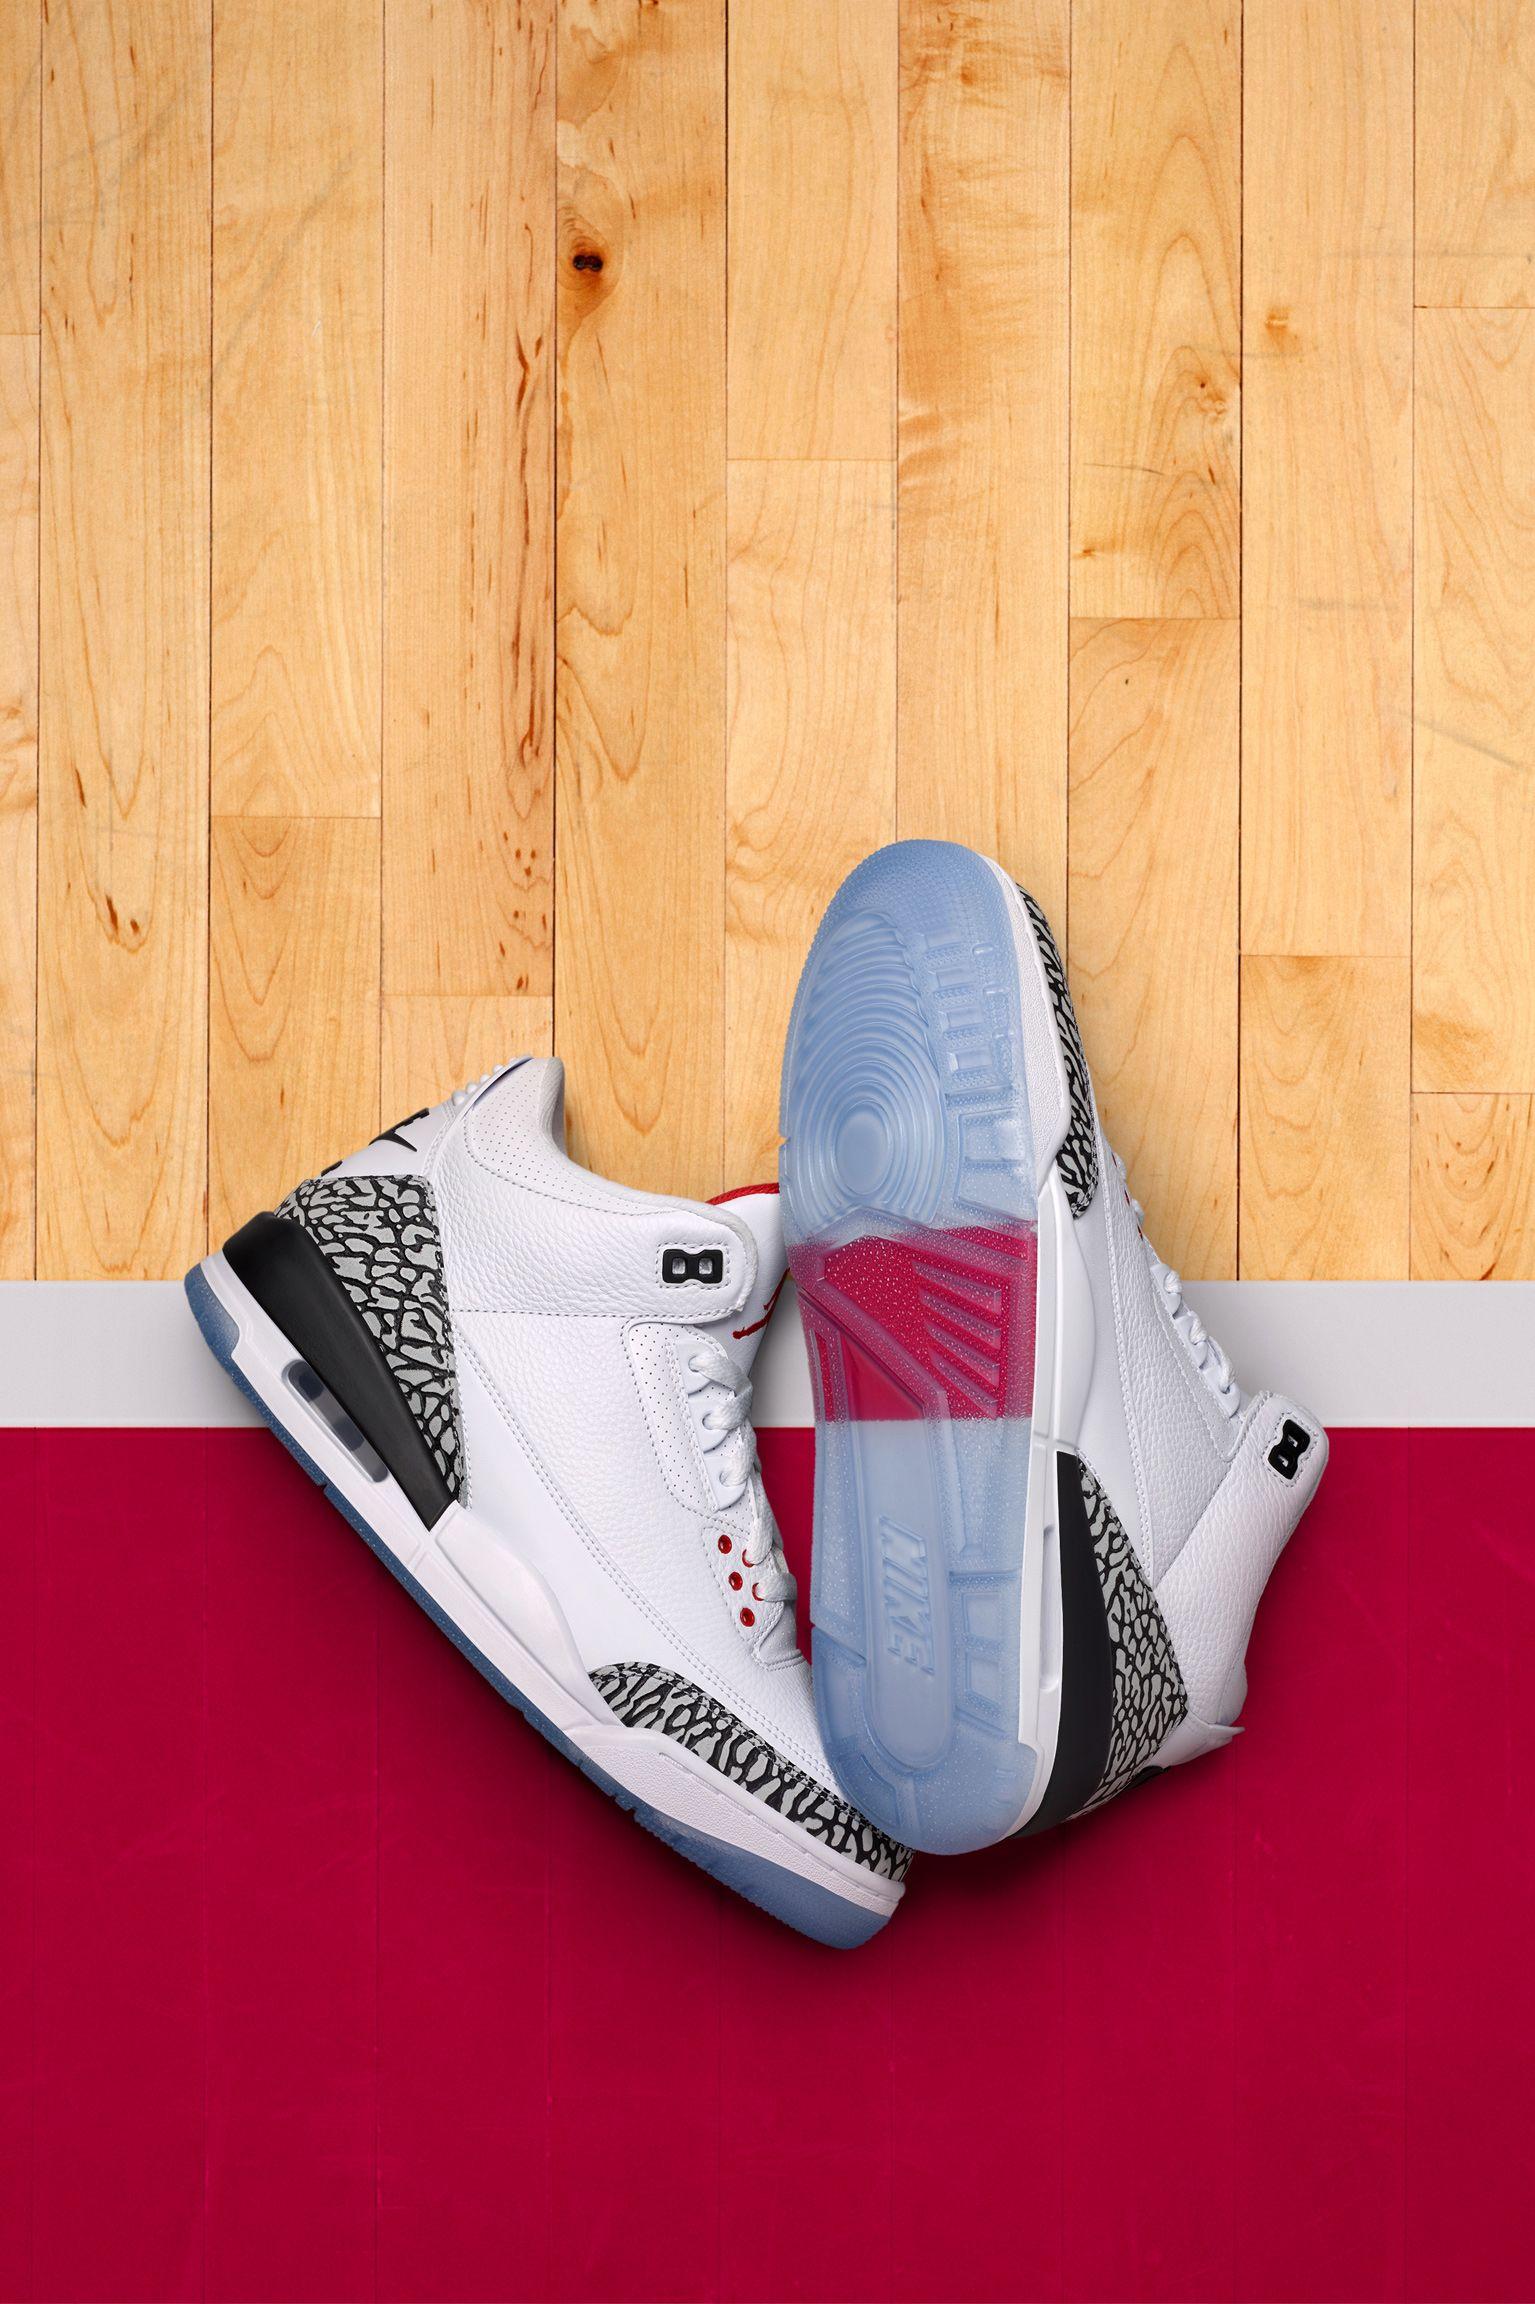 Air Jordan 3 'Free Throw Line' Release Date